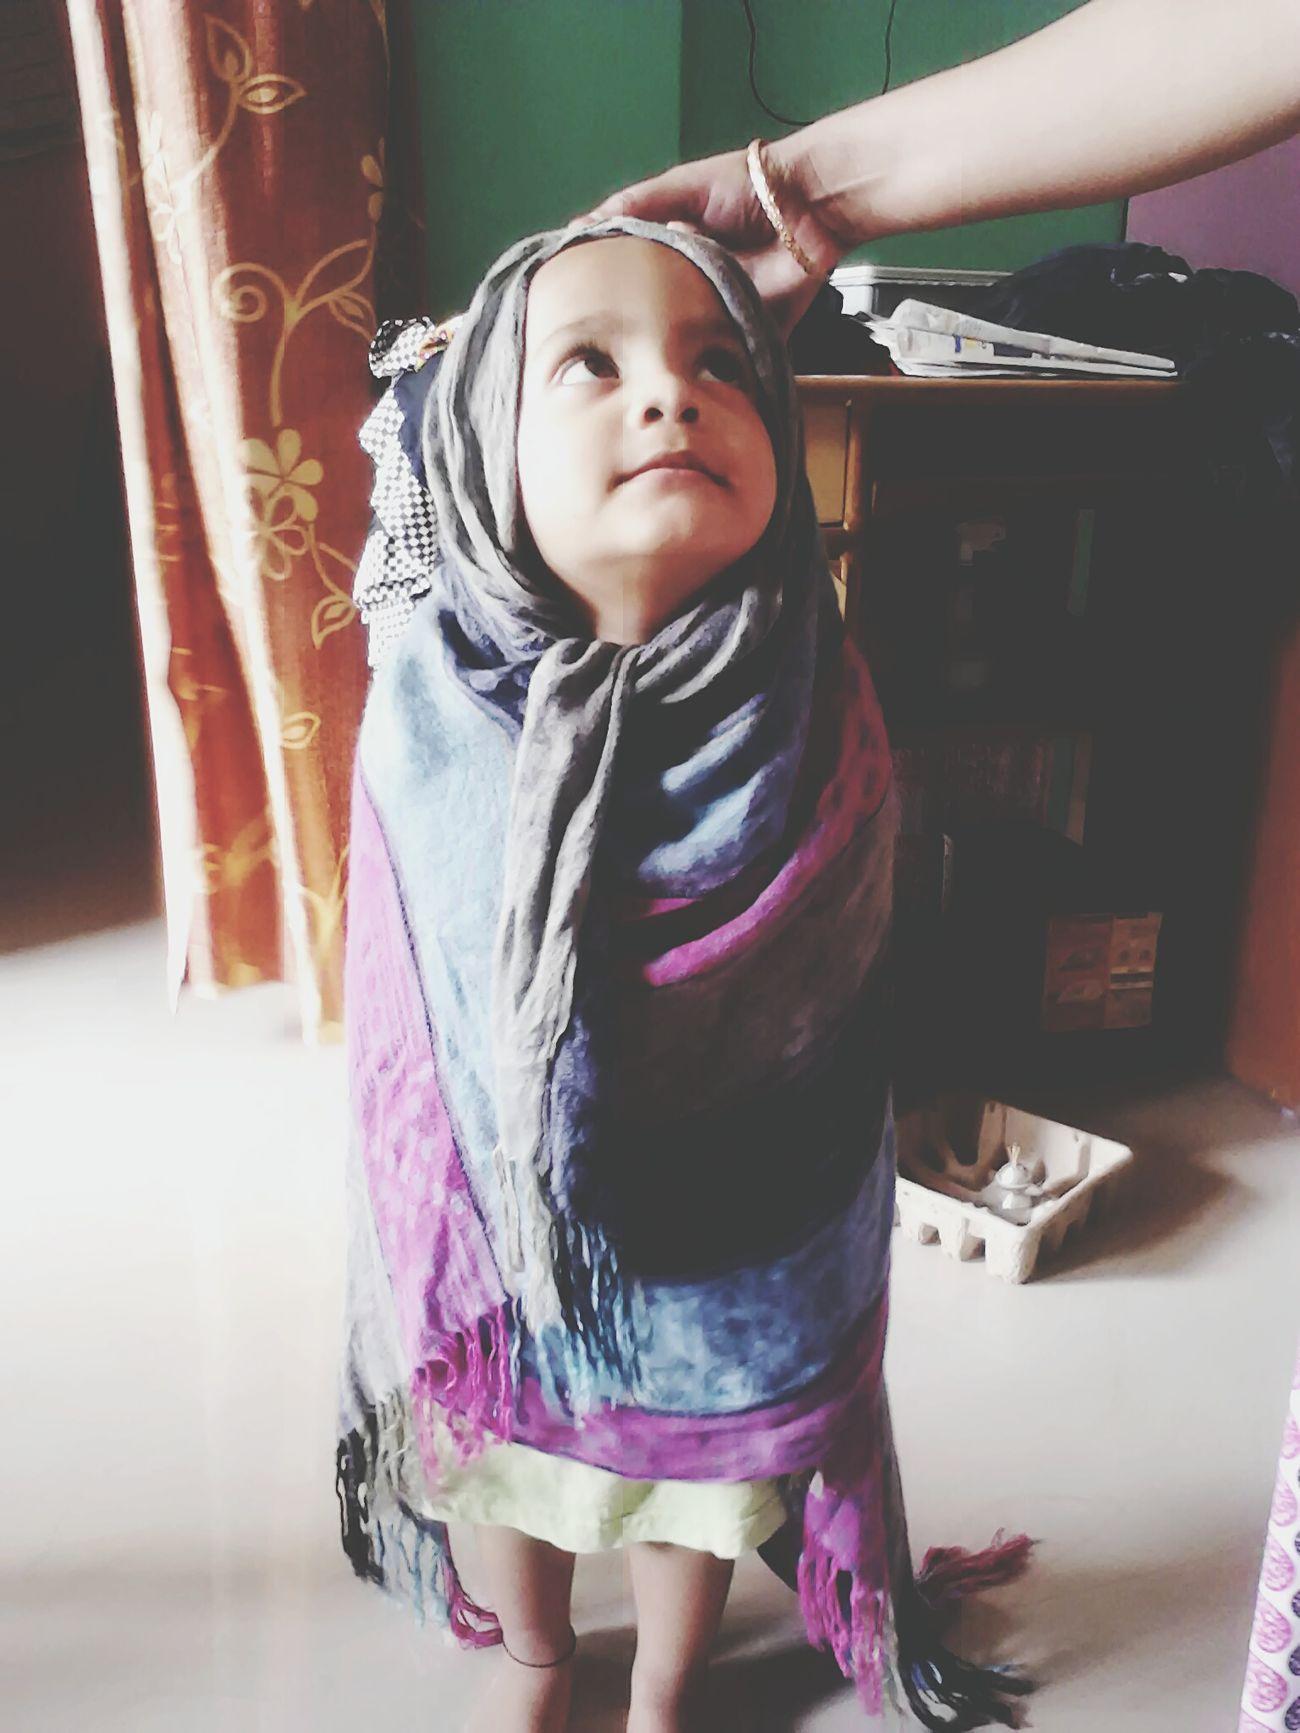 Playing Taking Photos Embraceyourgoofiness Having Fun :) Little Girl Playing Dress Up Cute♡ Bundle Of Joy Kidhavingfun Playtime